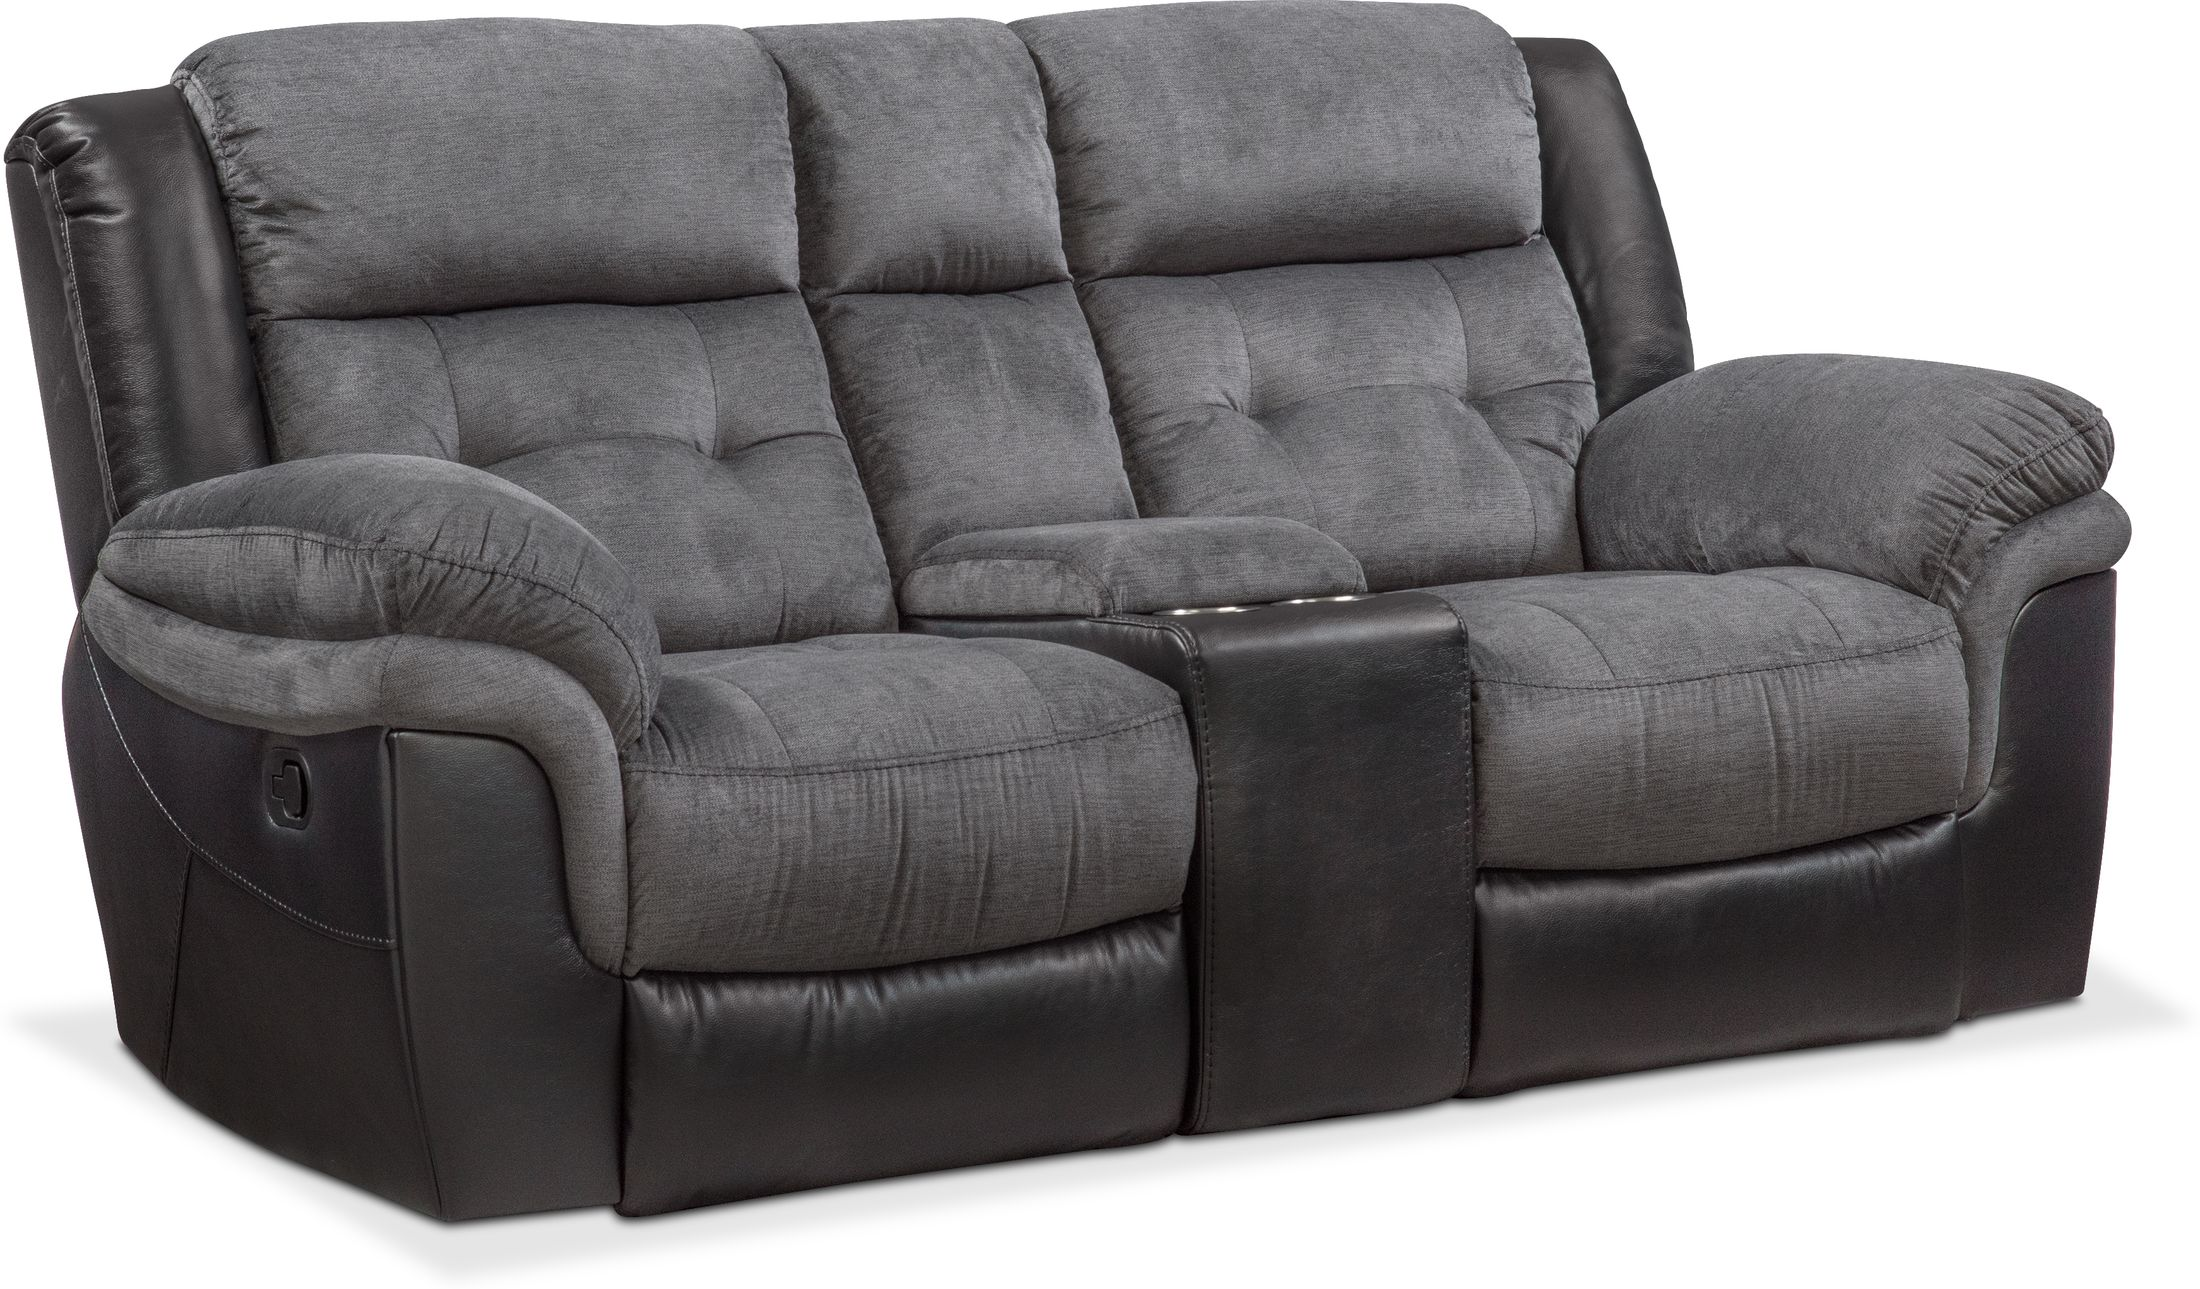 Living Room Furniture - Tacoma Manual Reclining Loveseat